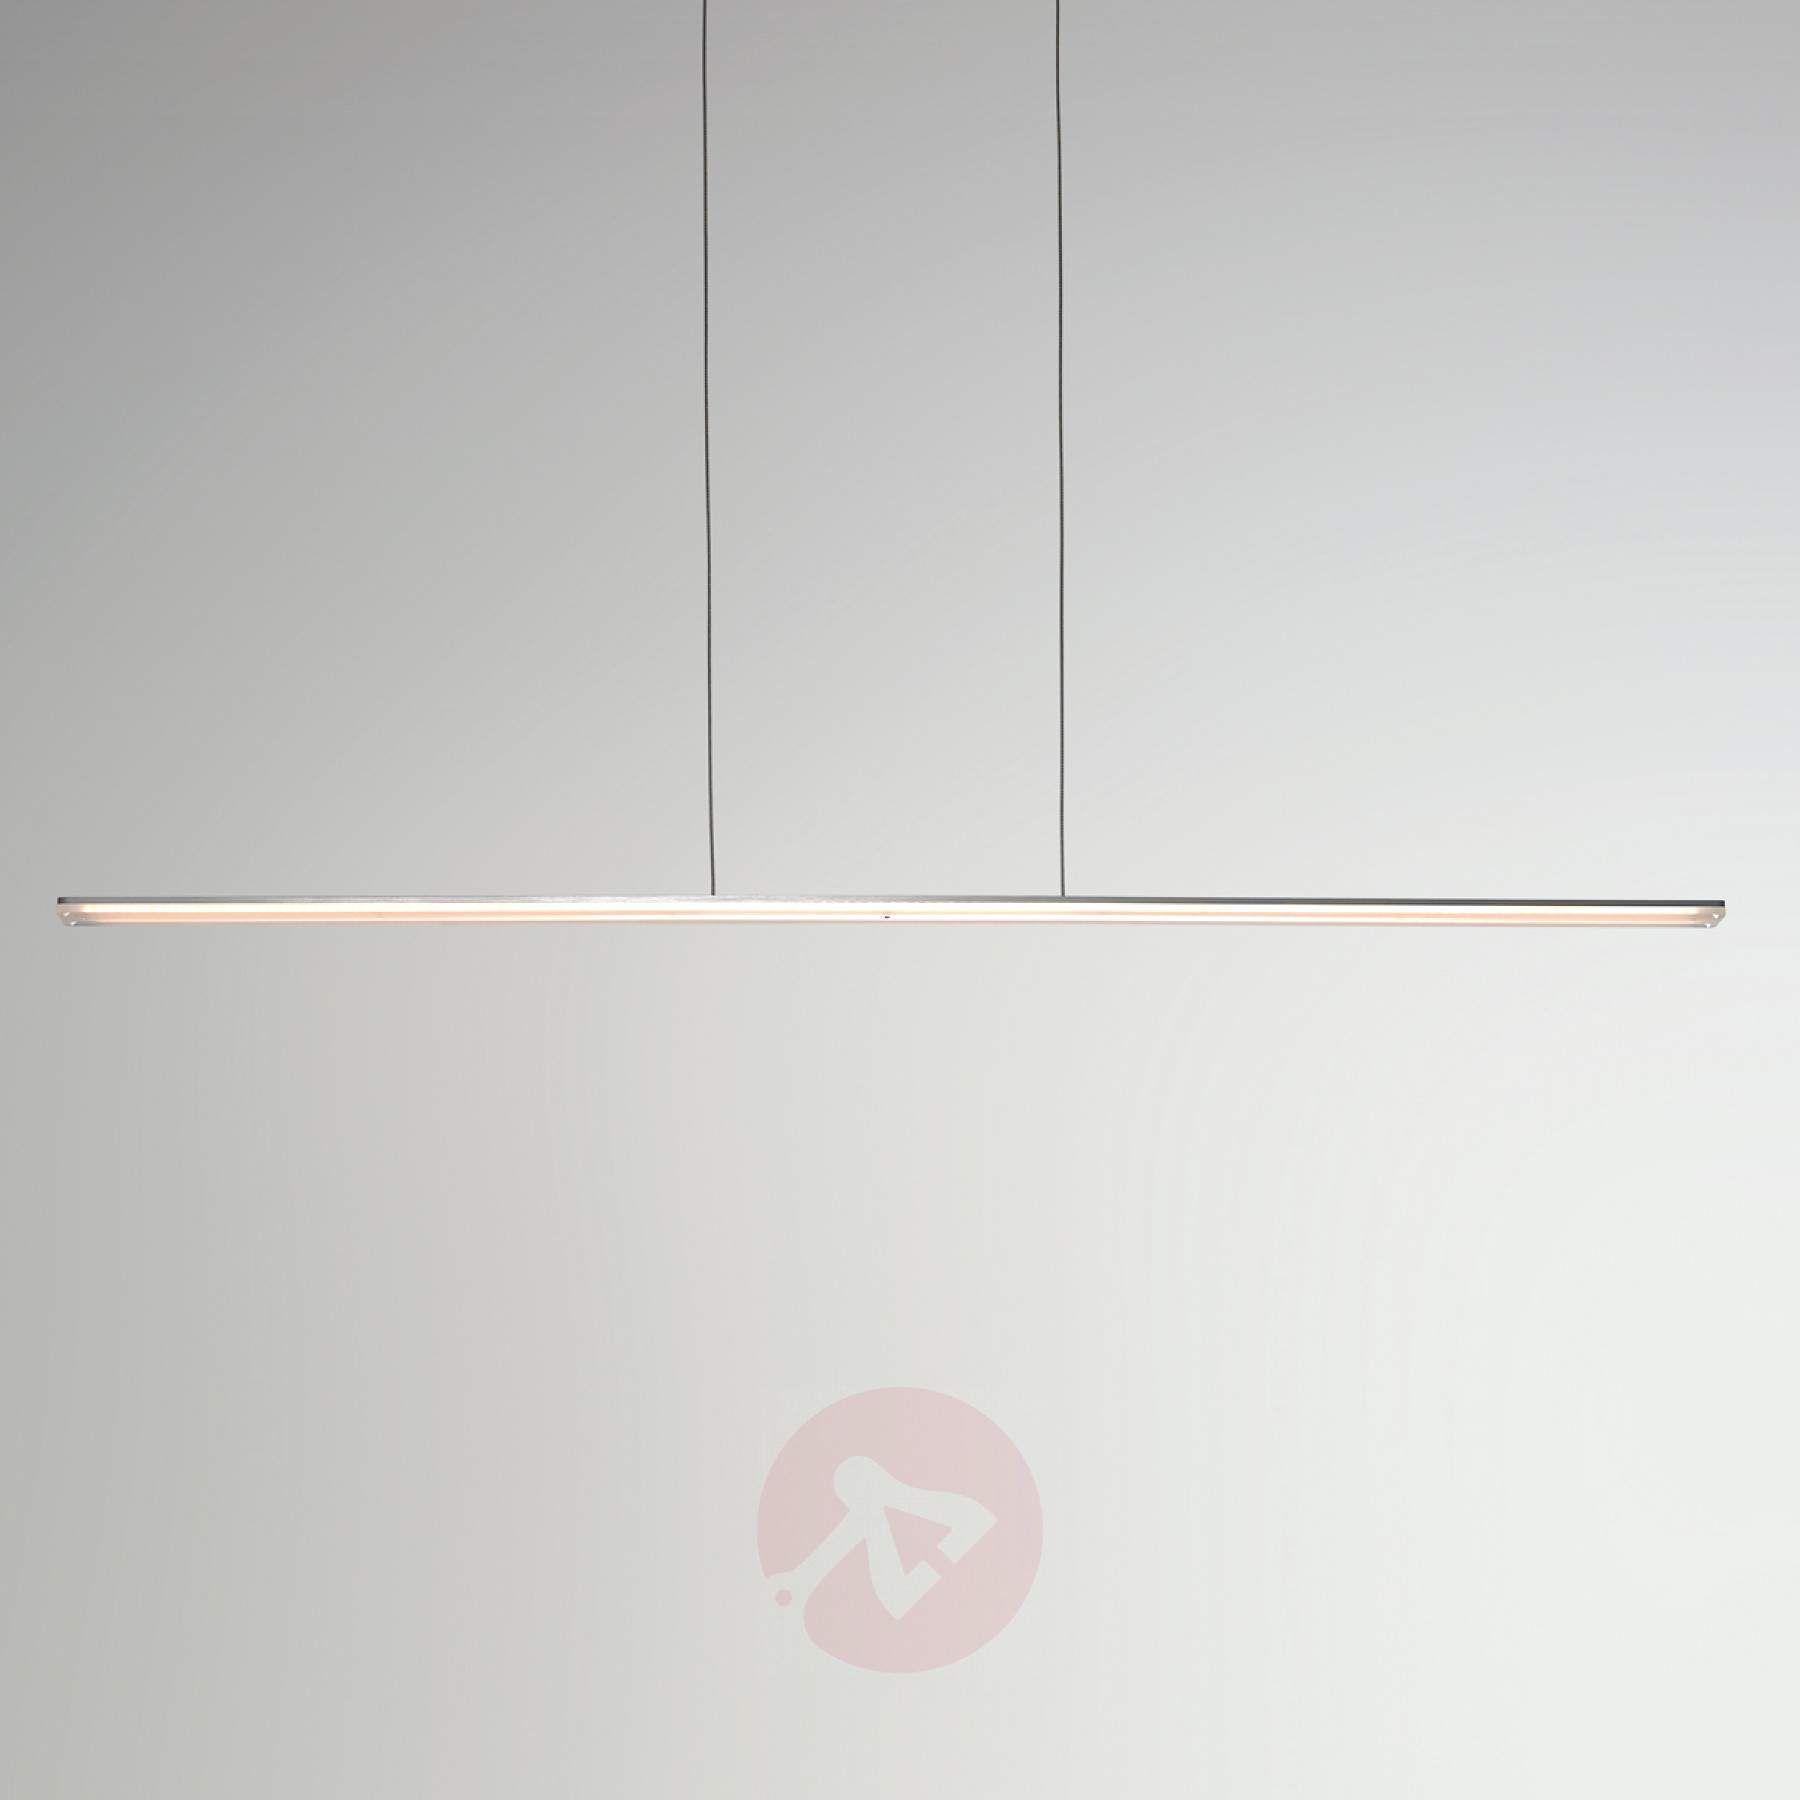 Skrivebordslamper | Lampegiganten.no